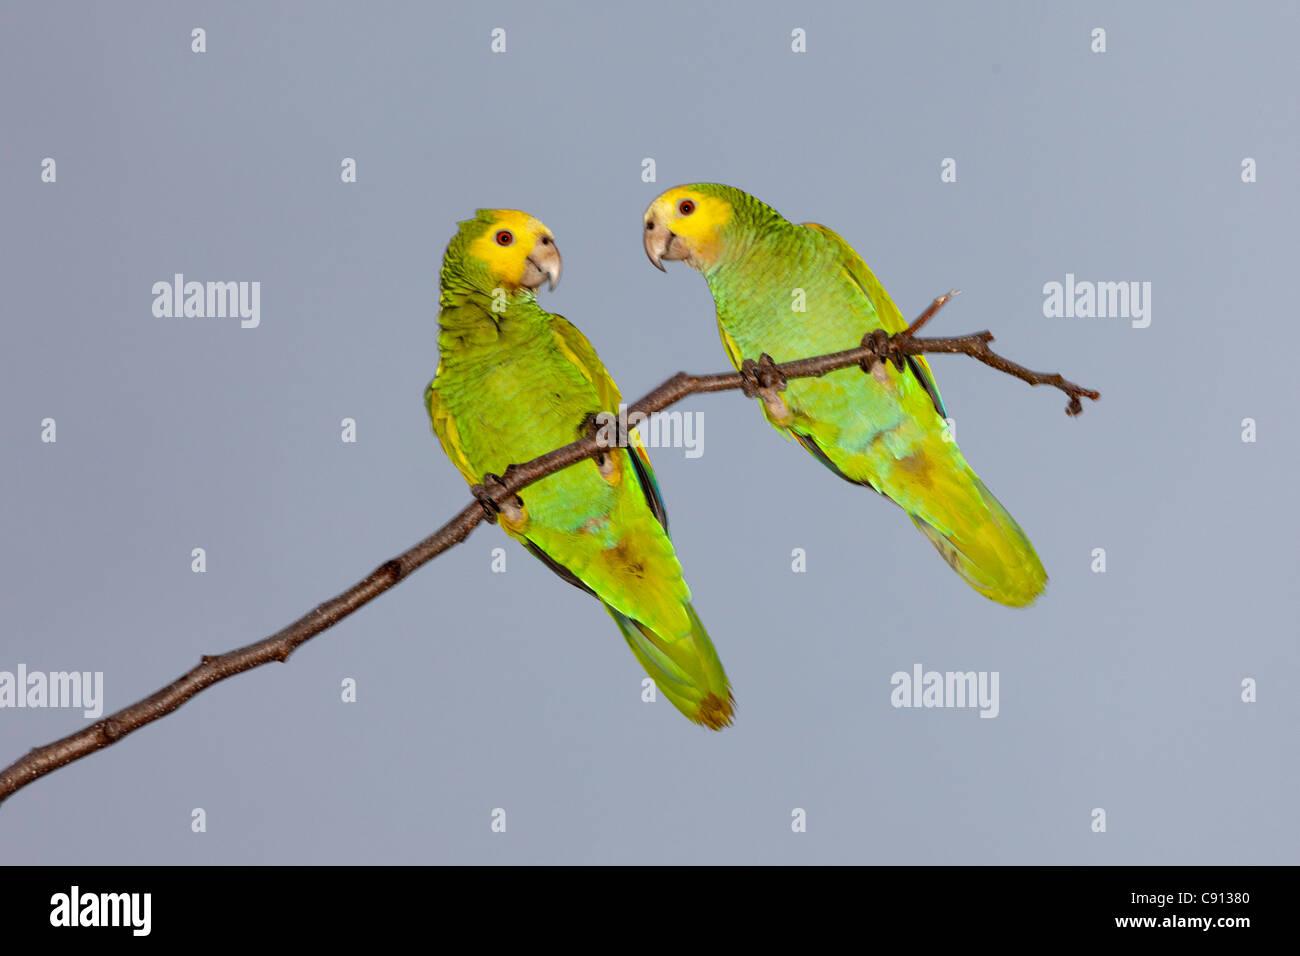 The Netherlands, Bonaire Island, Dutch Caribbean, Kralendijk, Couple of small parrots, parakeets. - Stock Image